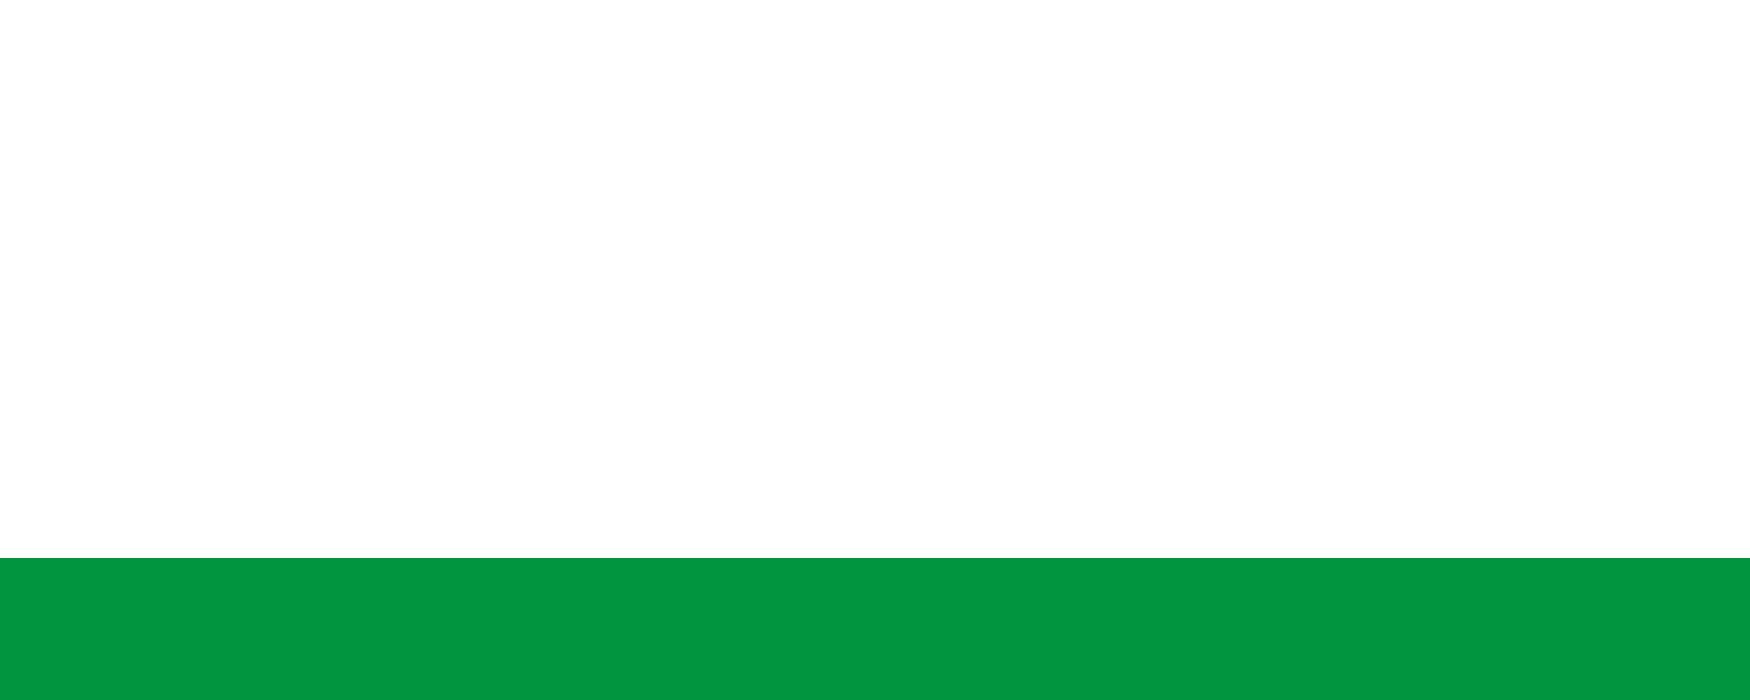 Green Box Base